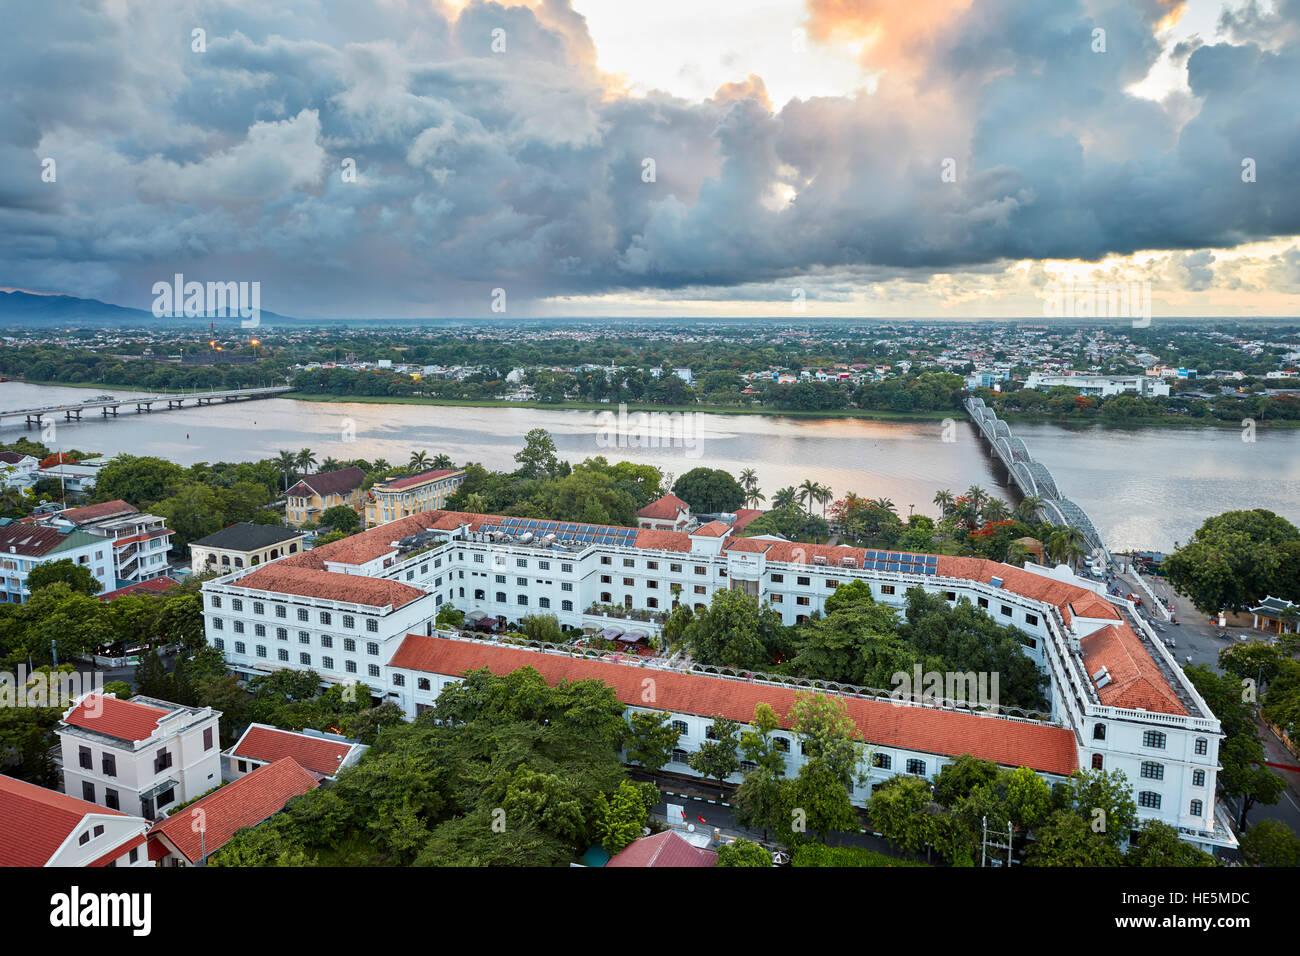 Elevated view of the Saigon Morin Hotel. Hue, Vietnam. Stock Photo